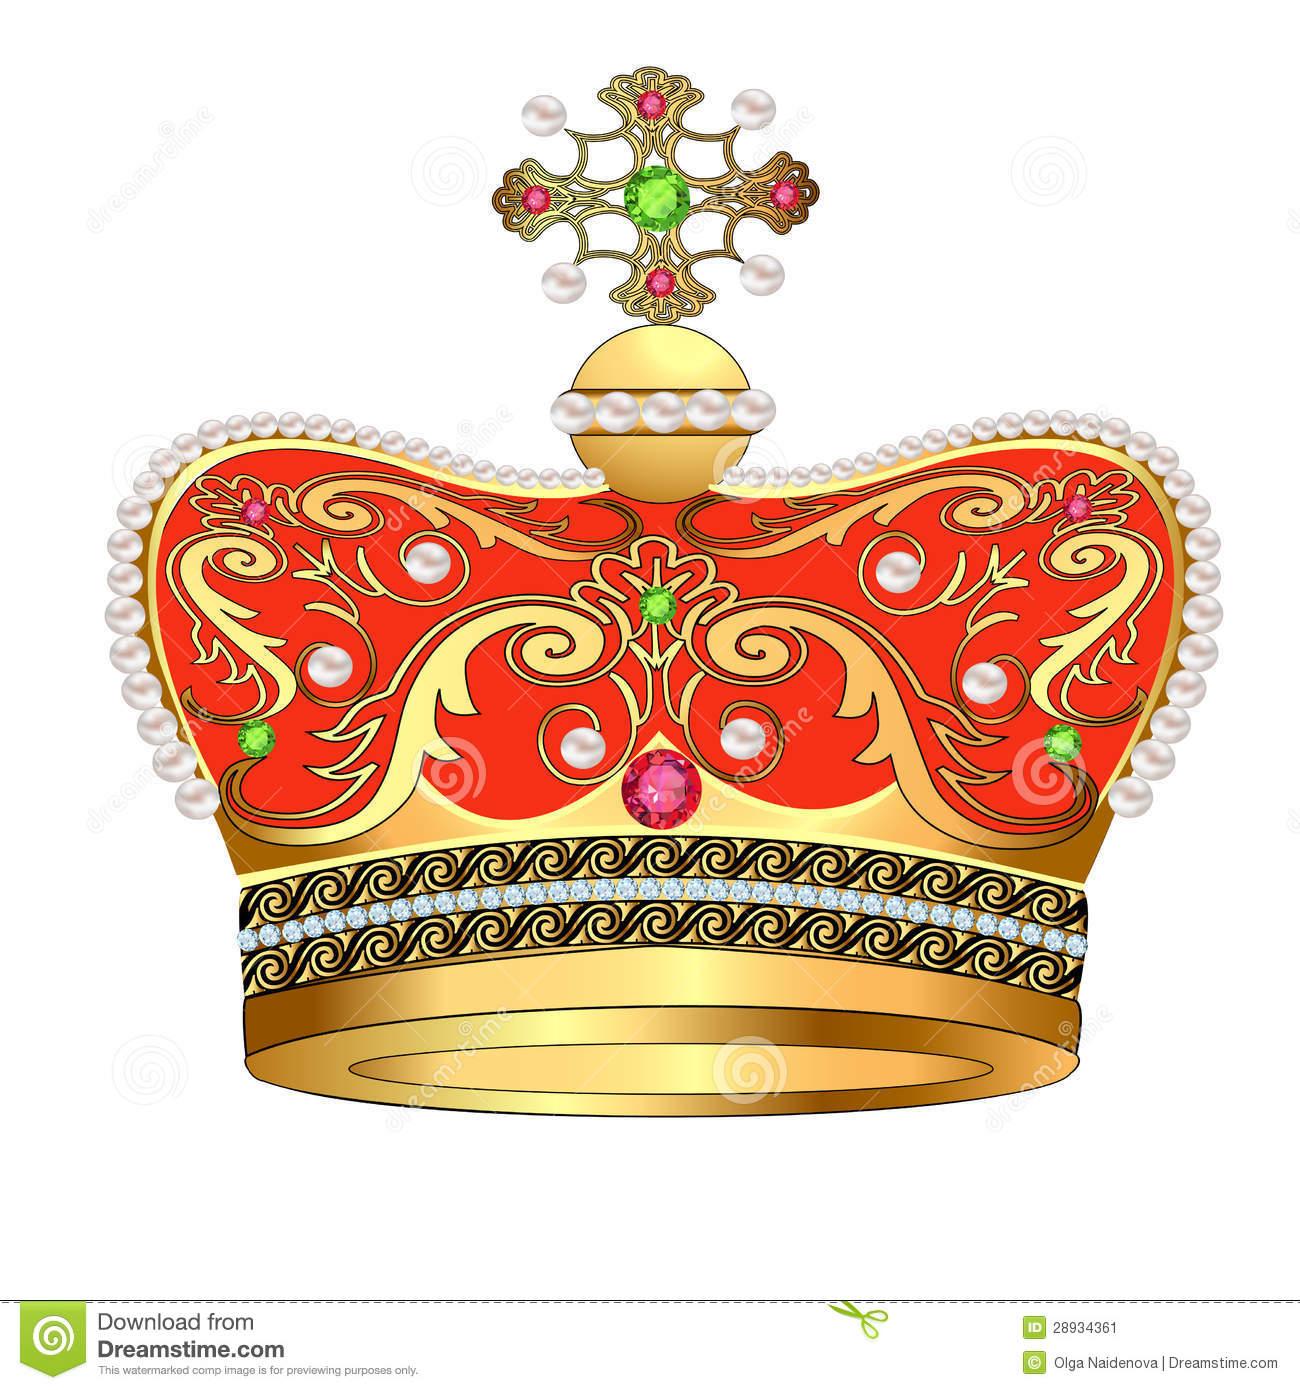 Gems clipart crown jewels Royal Jewels Jewels Crown Clipart